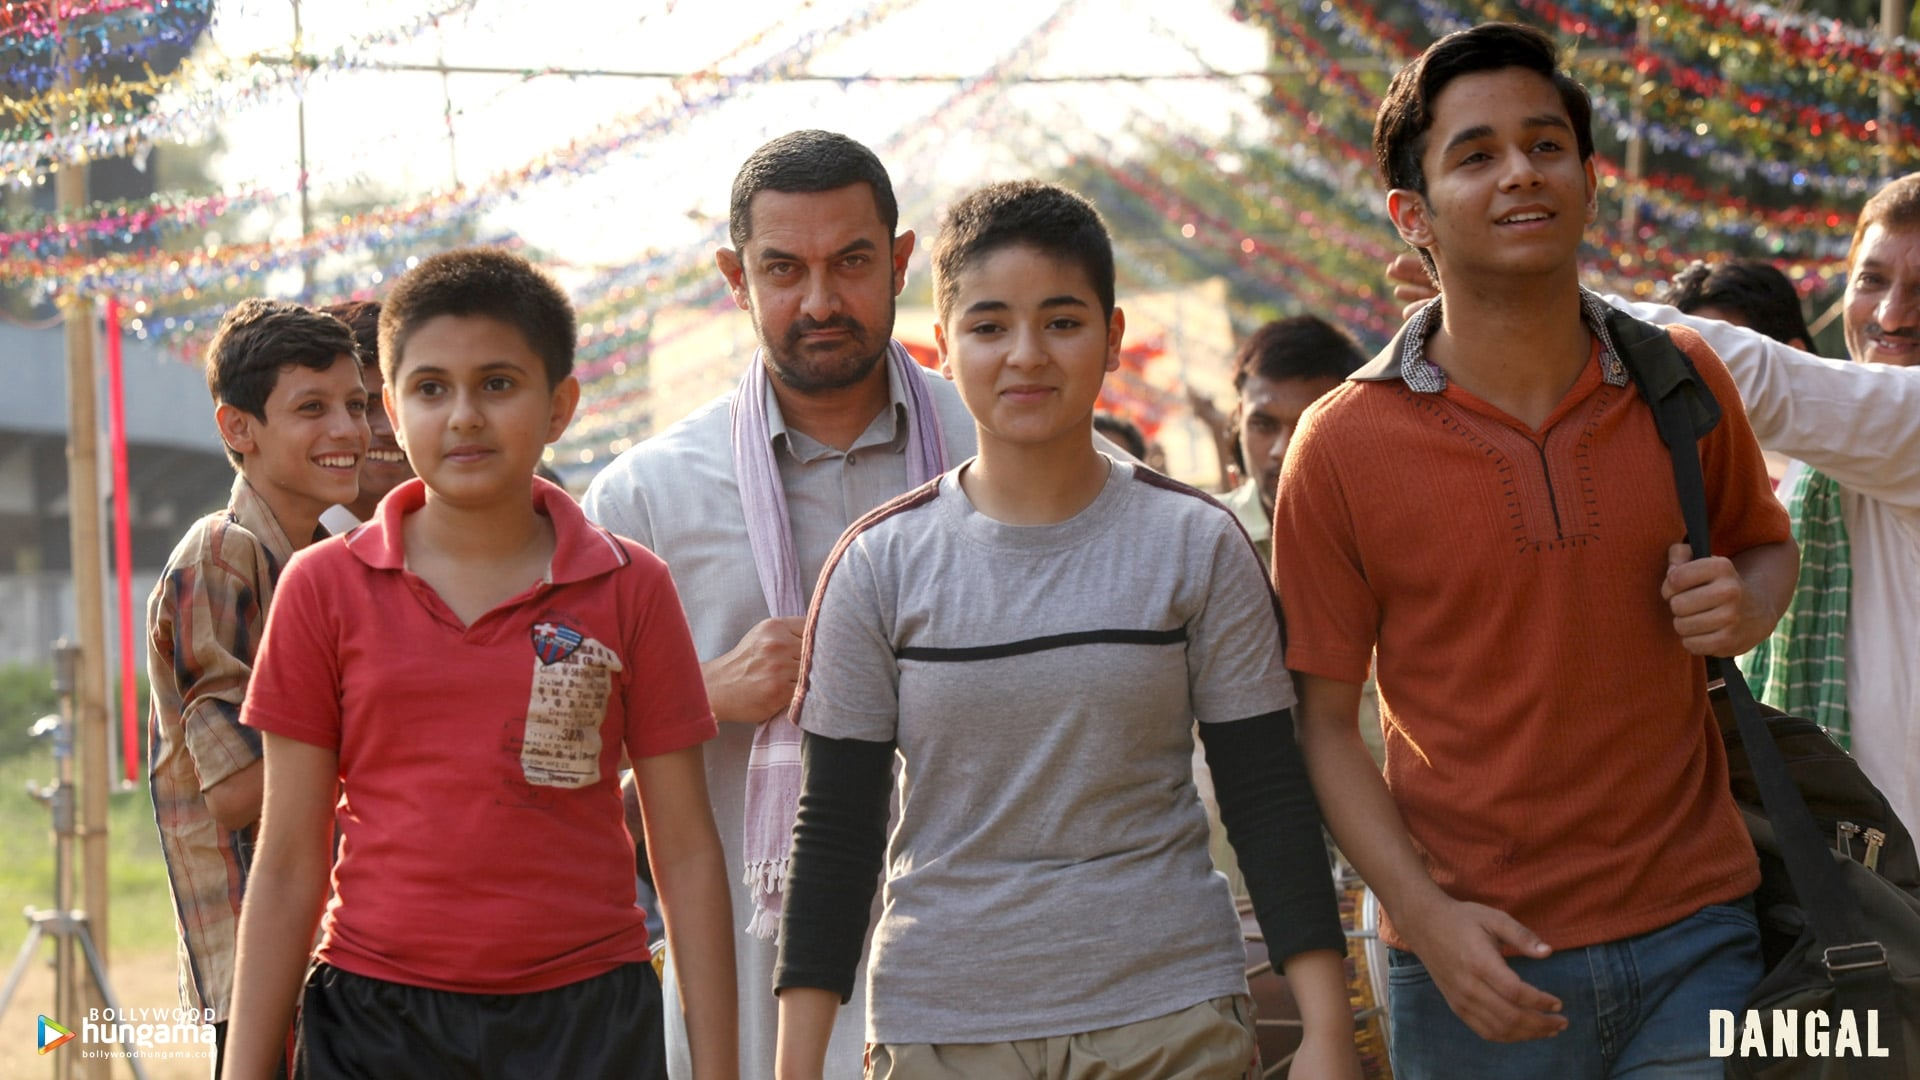 Dangal 2016 Full Movie Download Watch Online Free In Hd